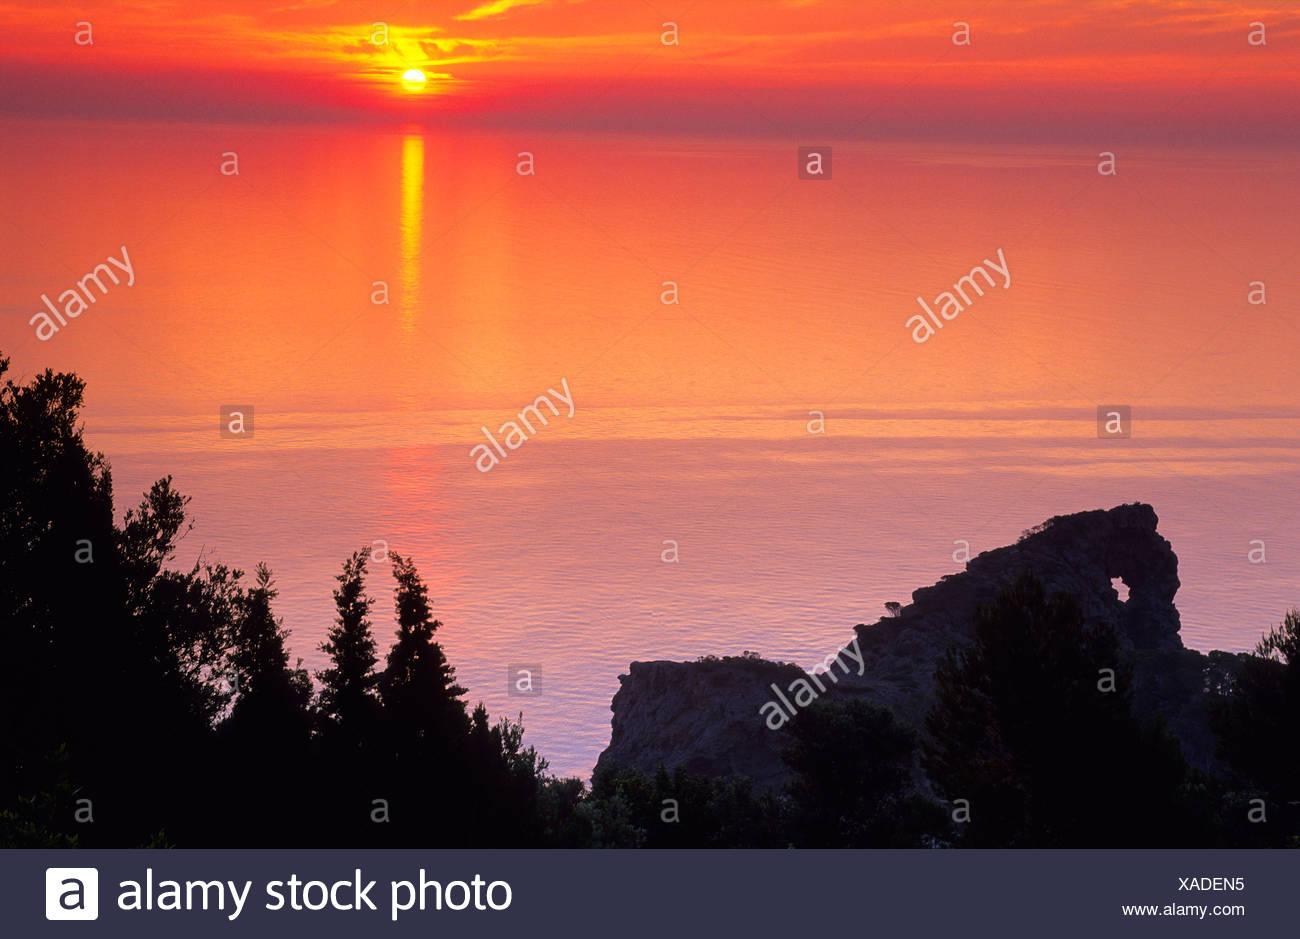 Europe, Spain, Majorca, eastern coast. Sunset - Stock Image